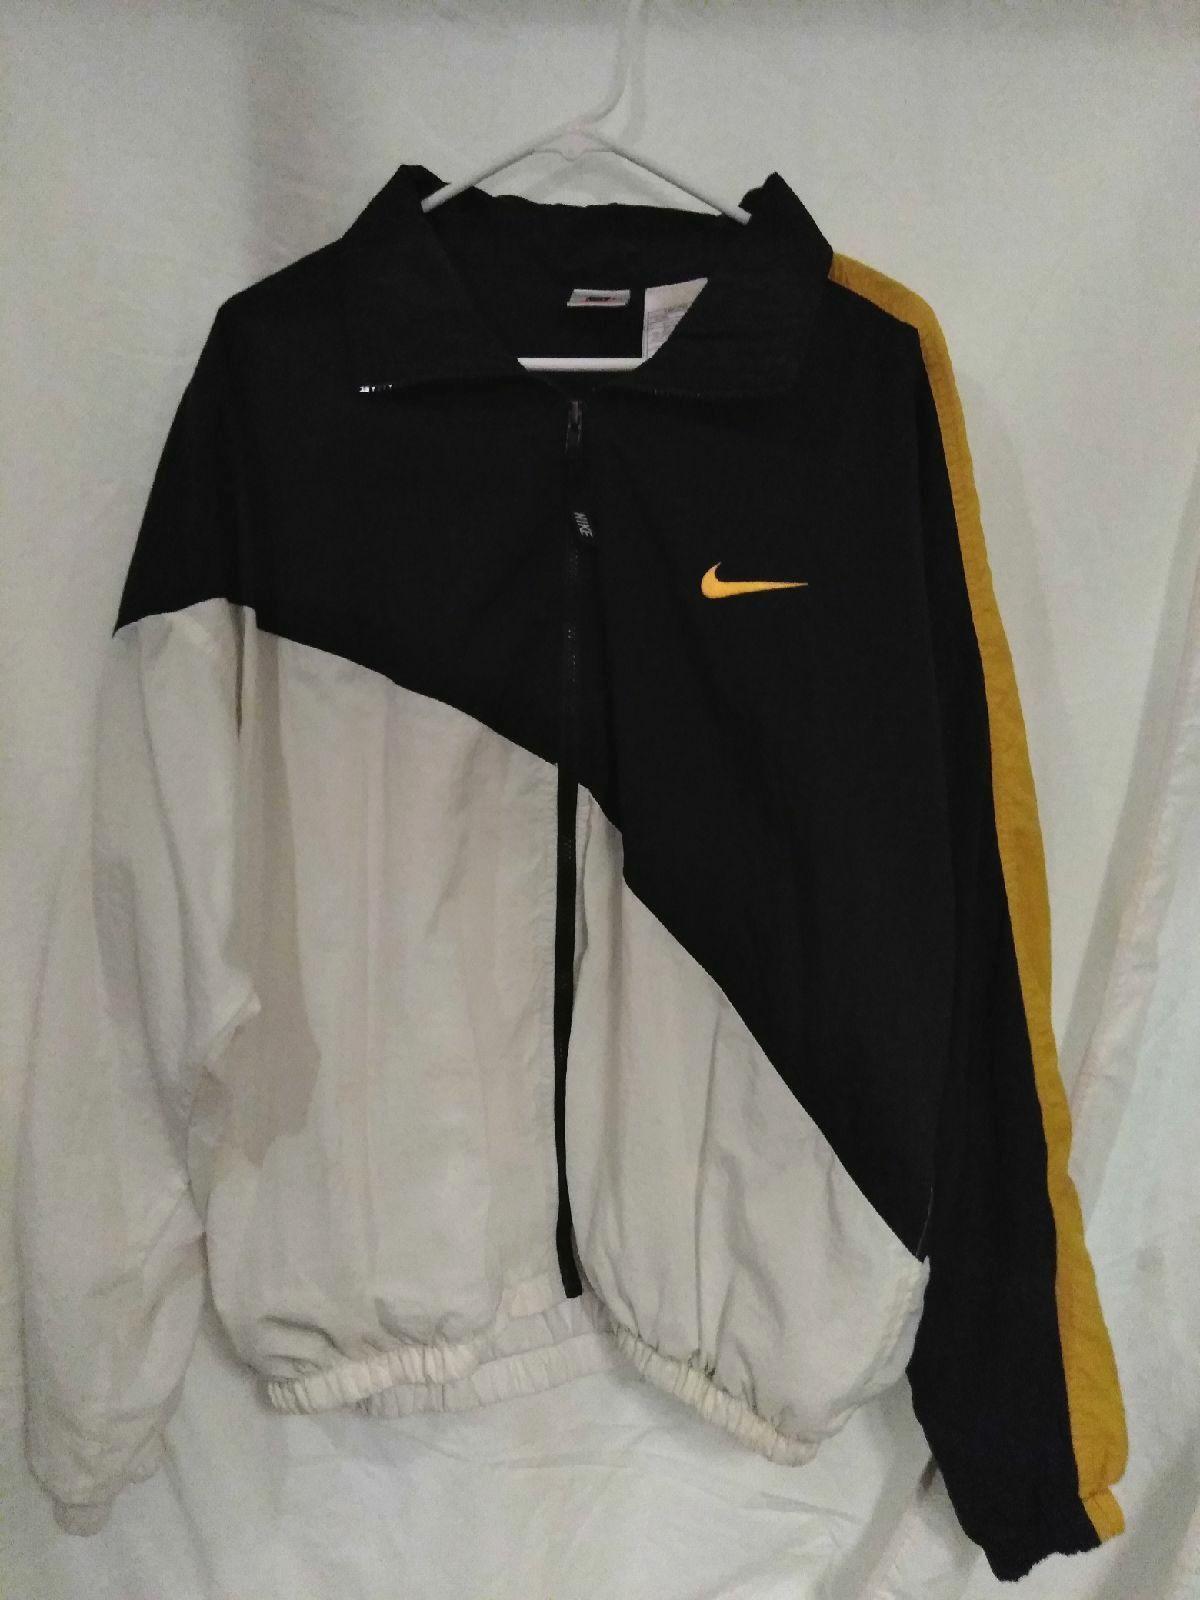 Vintage Nike Windbreaker Jacket Size Large White Black And Gold With The Small Nik Vintage Windbreaker Jacket Nike Windbreaker Outfit Vintage Nike Windbreaker [ 1600 x 1200 Pixel ]